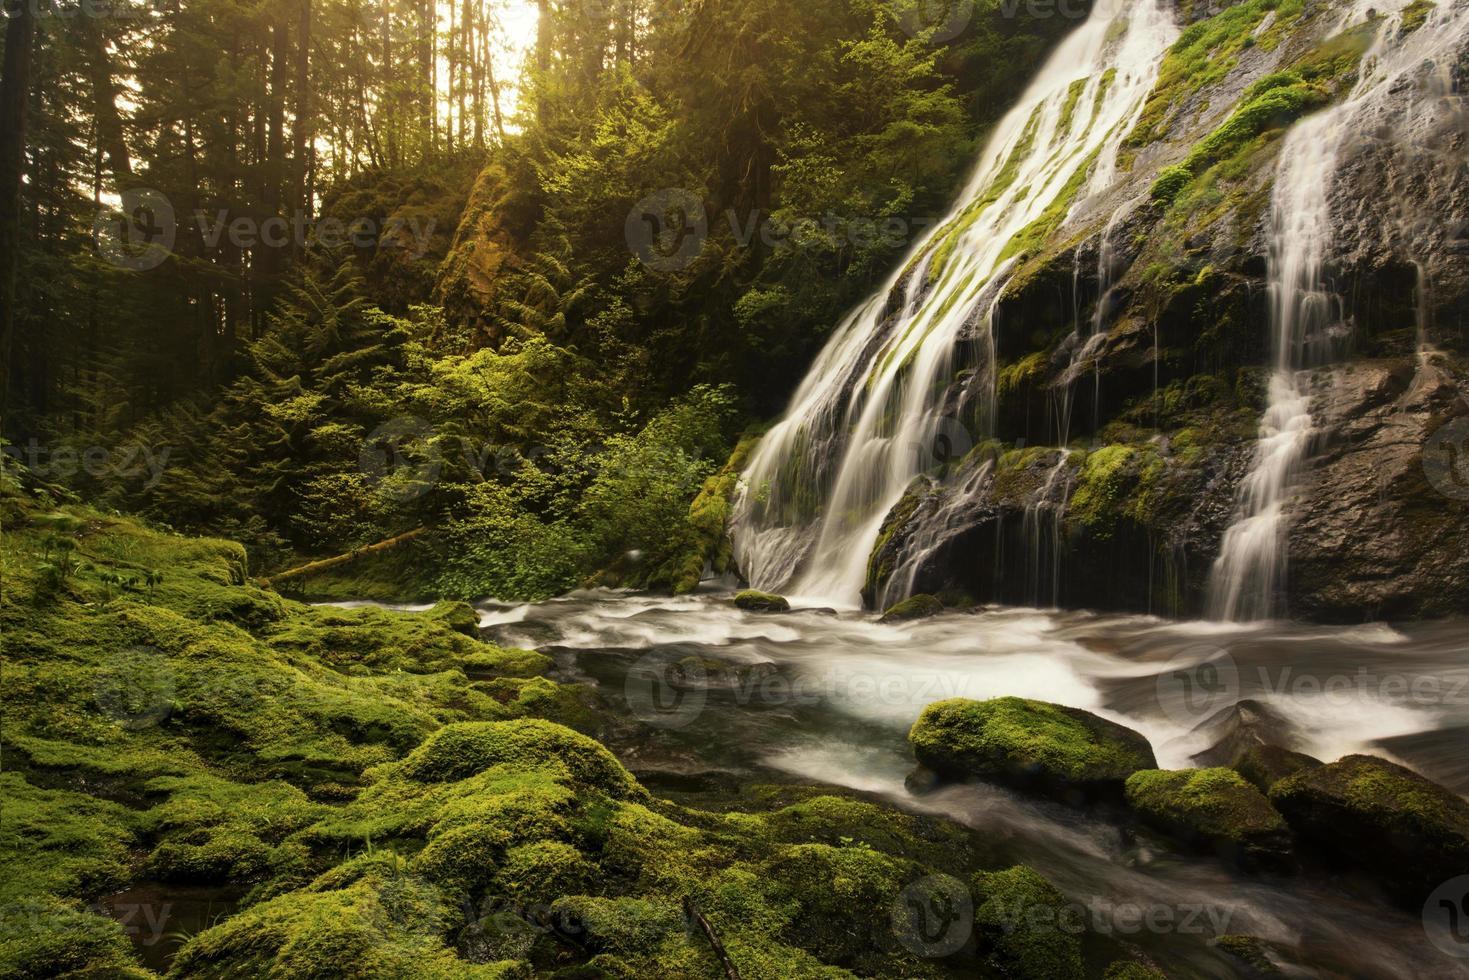 pantera creek falls foto